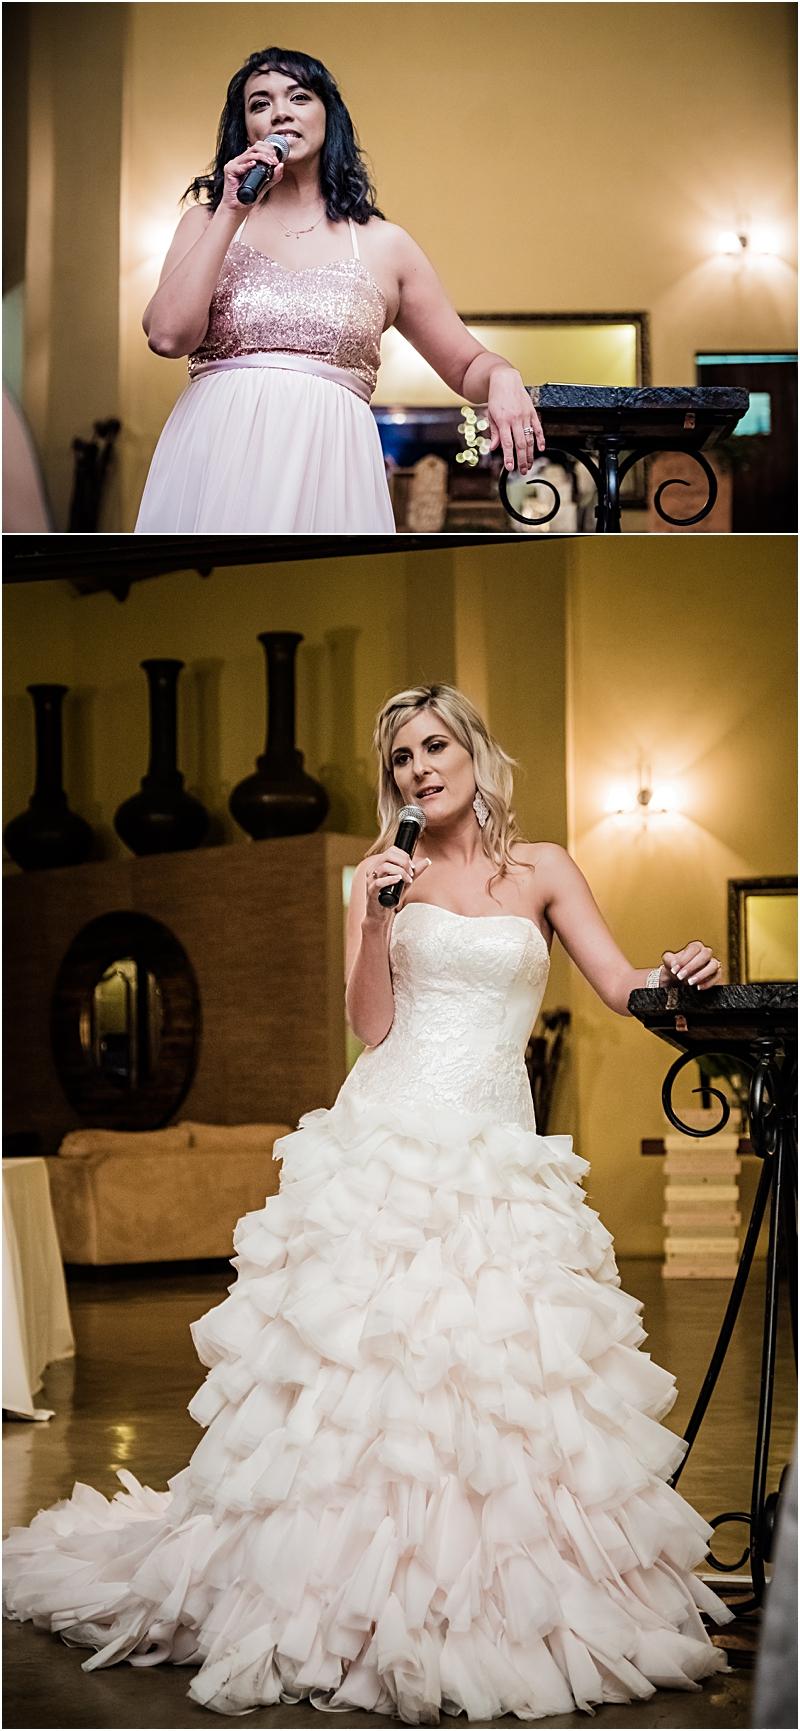 Best wedding photographer - AlexanderSmith_7501.jpg